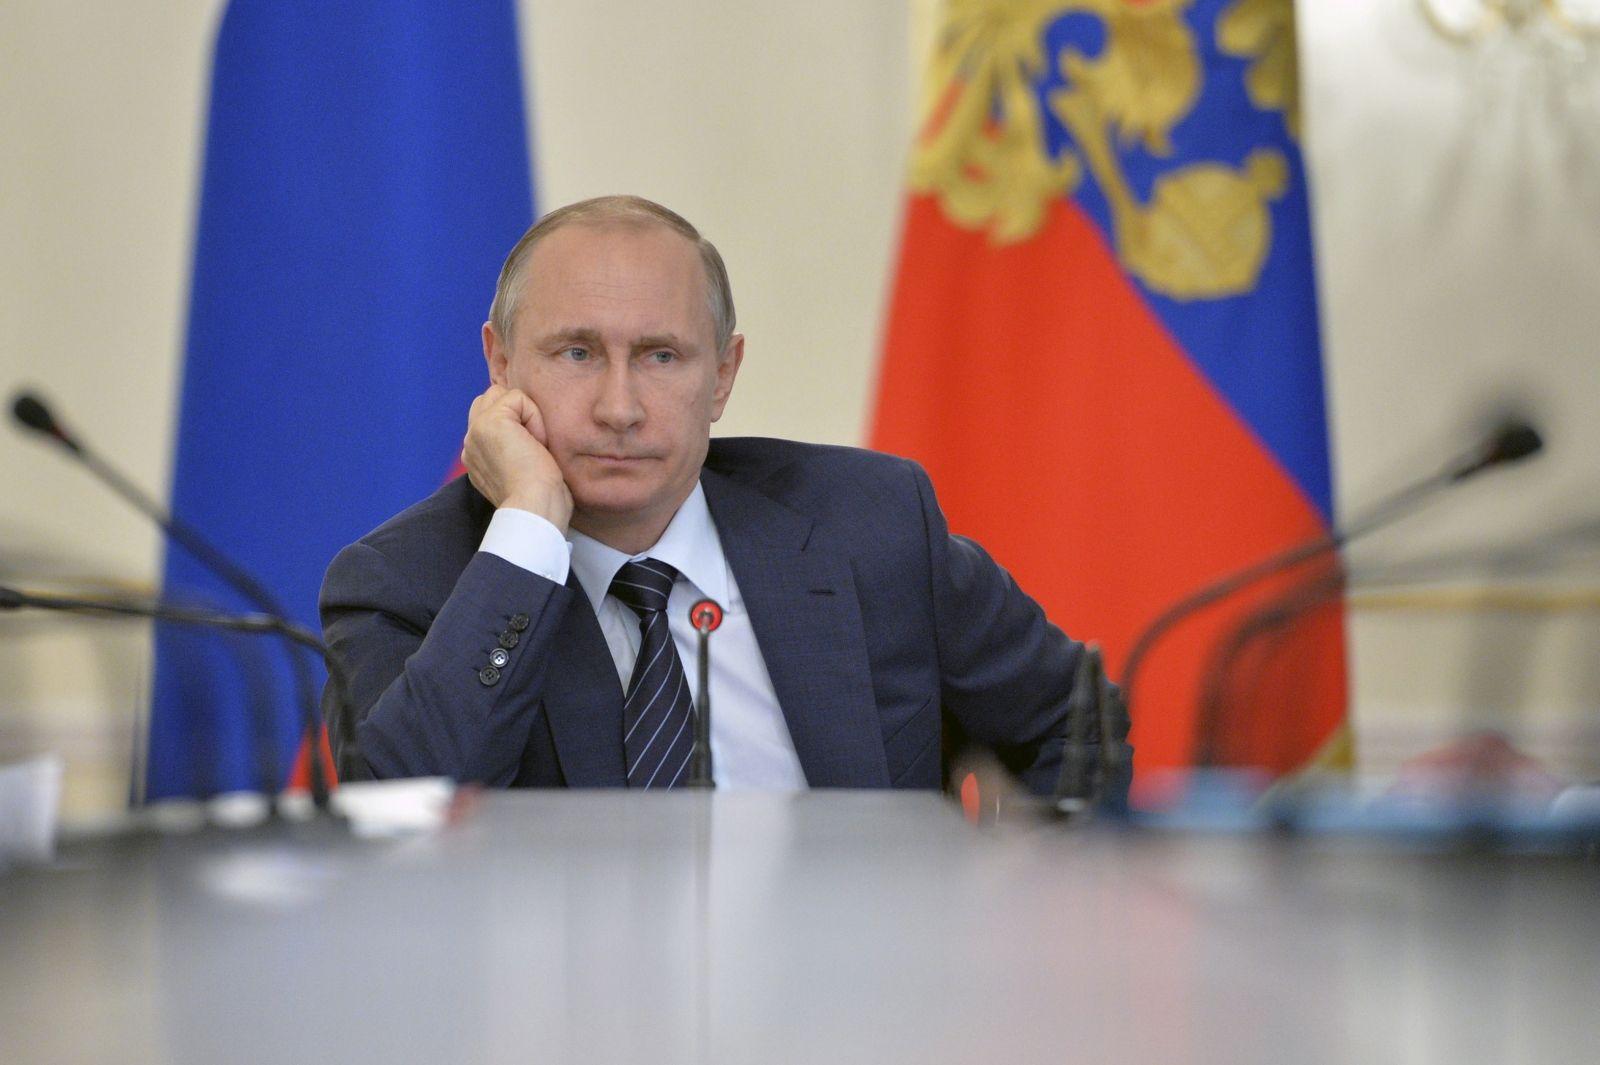 Navalny says Putin's daughter works for university